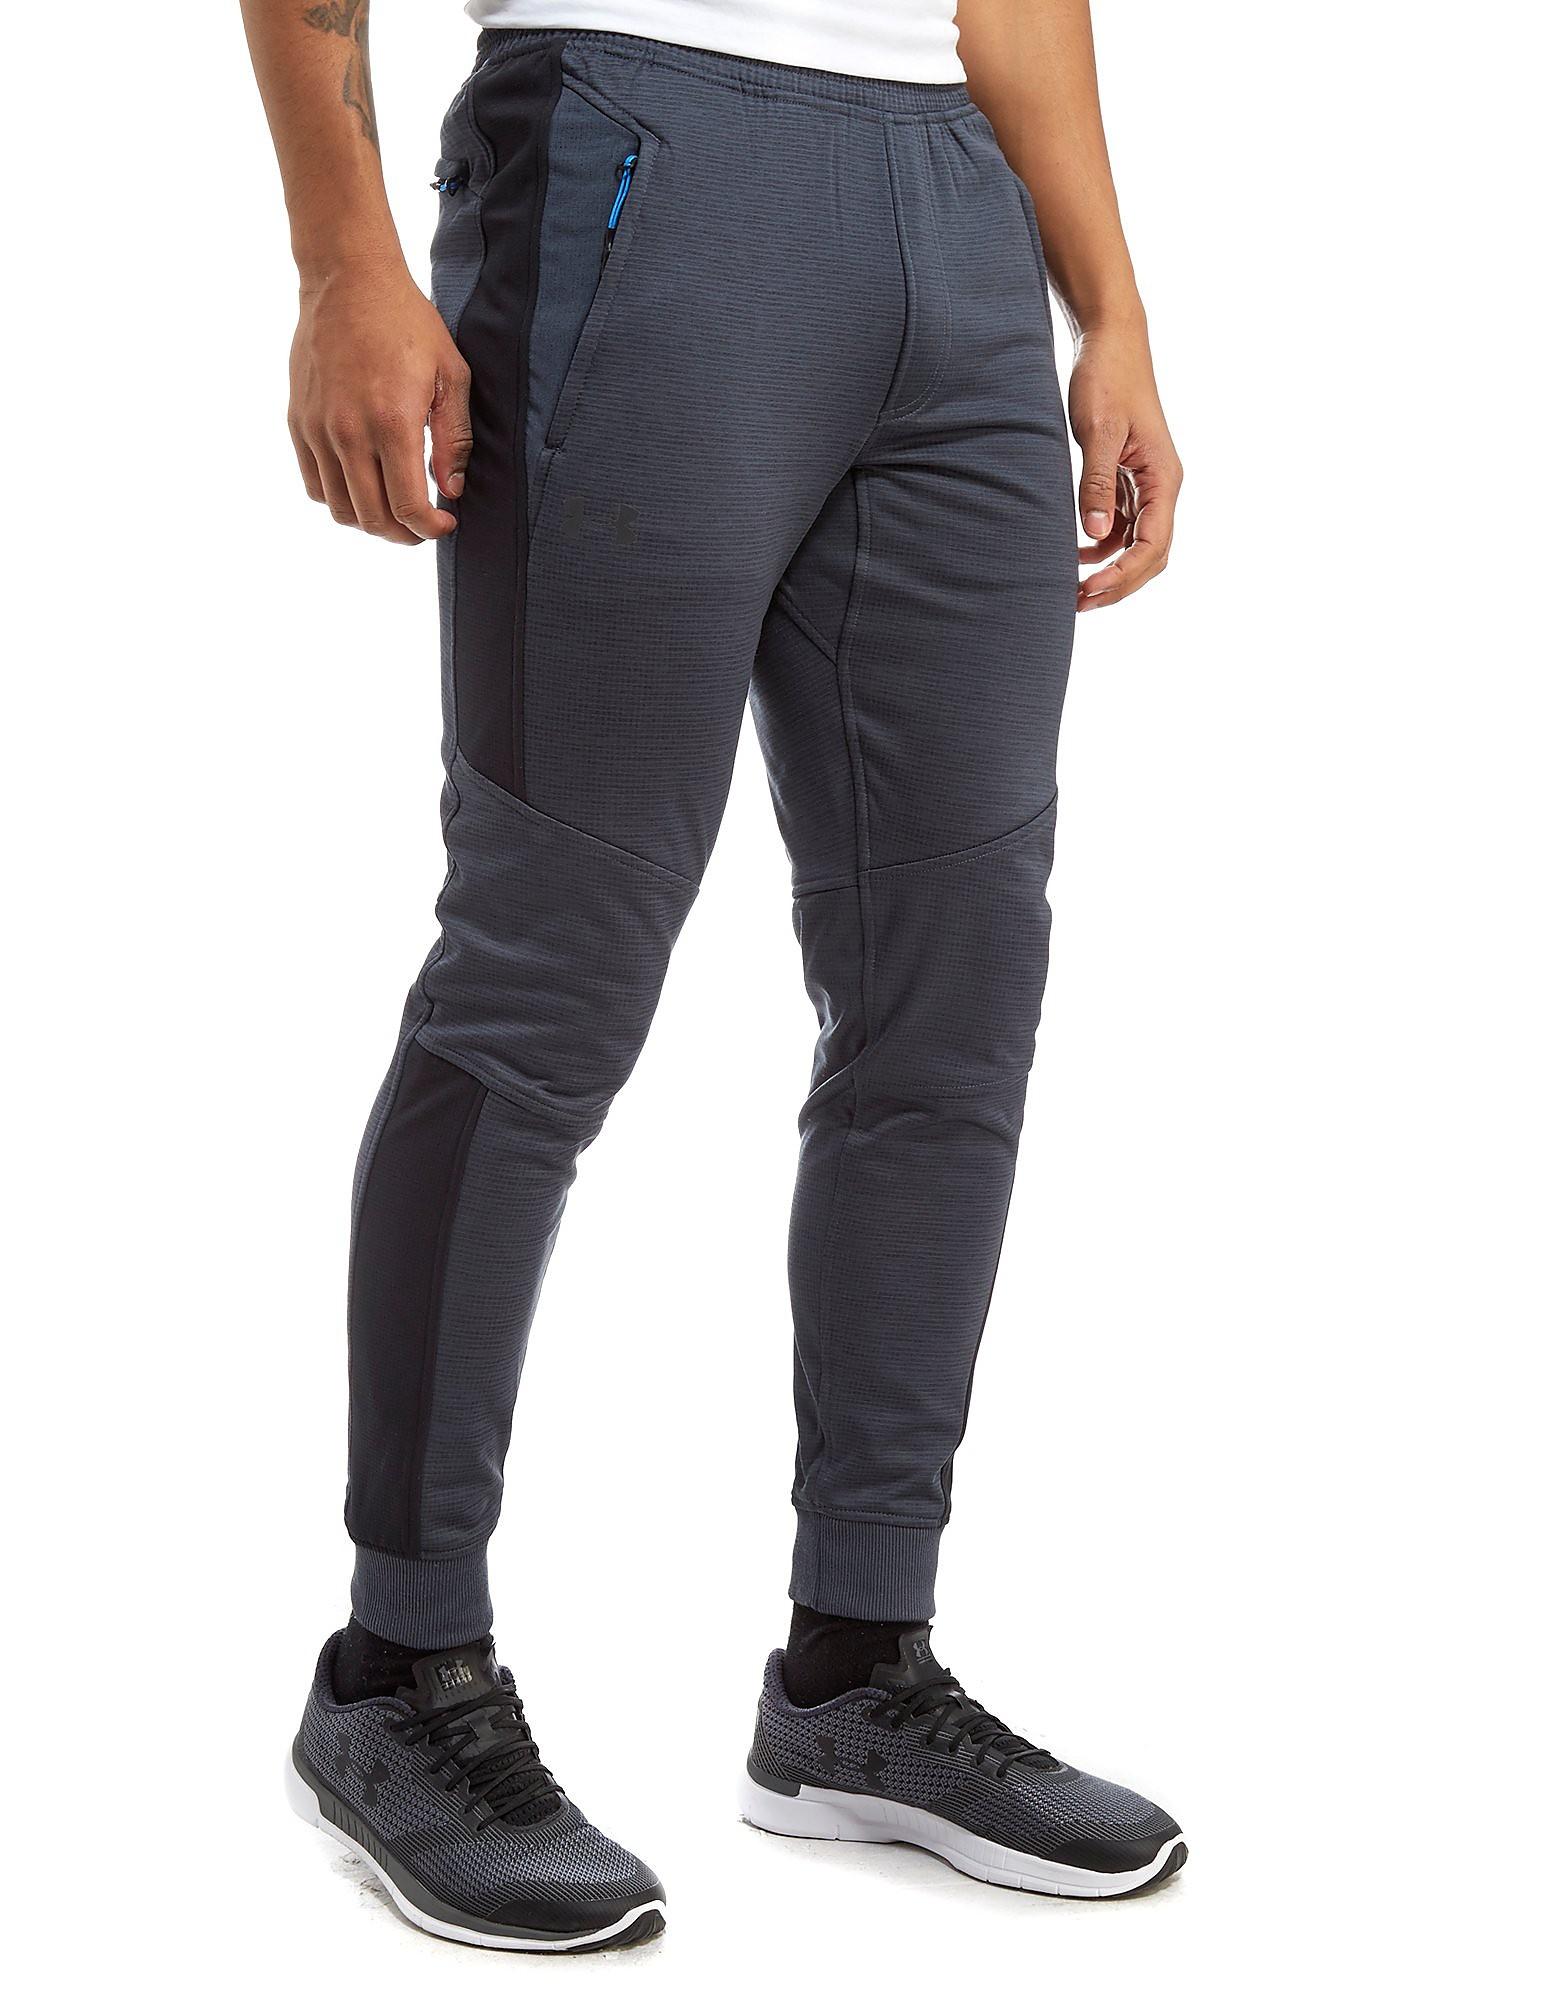 Under Armour Reactor Fleece Tapered Pants